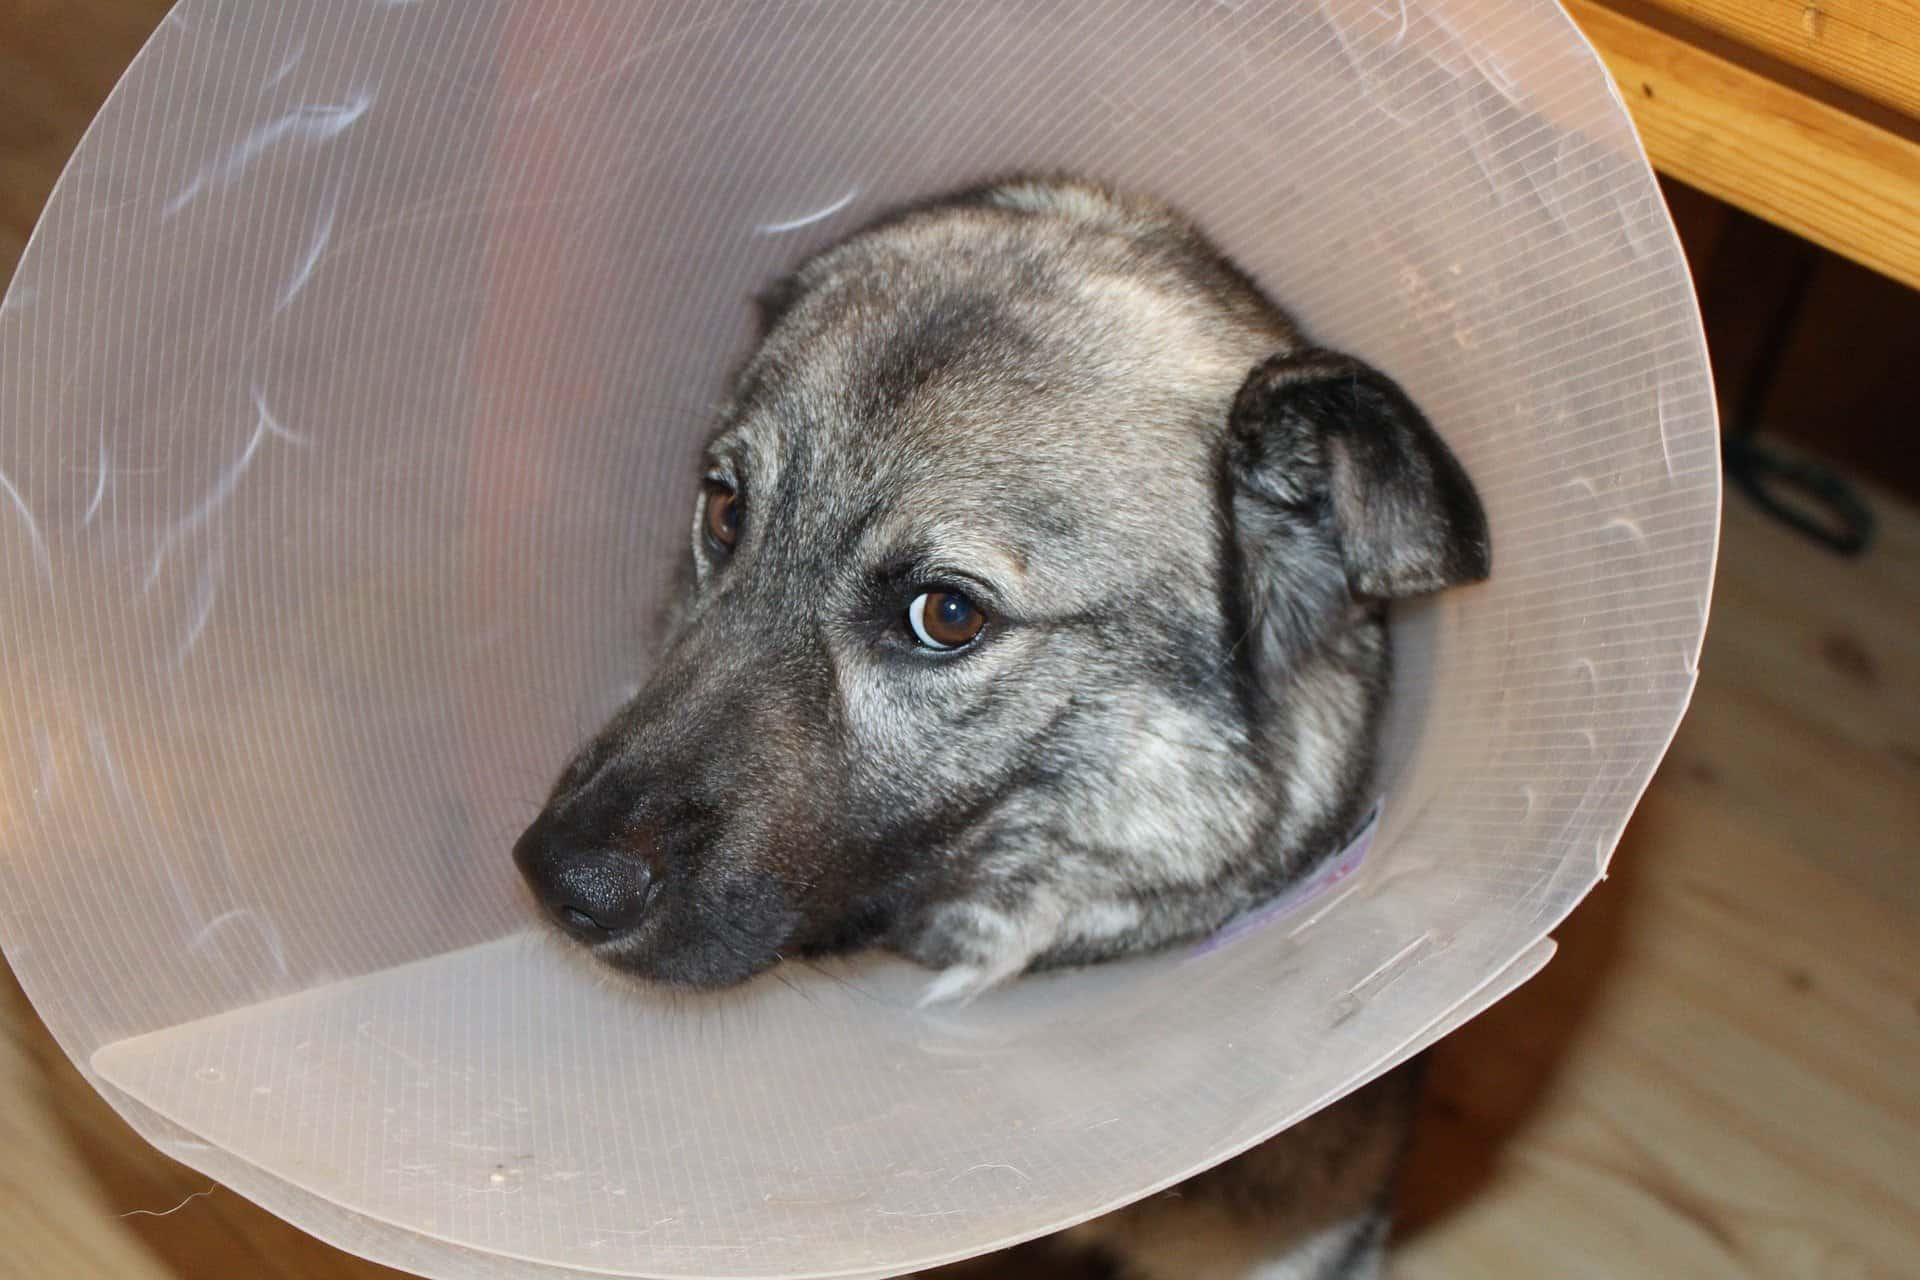 Dog Flea and Tick Prevention